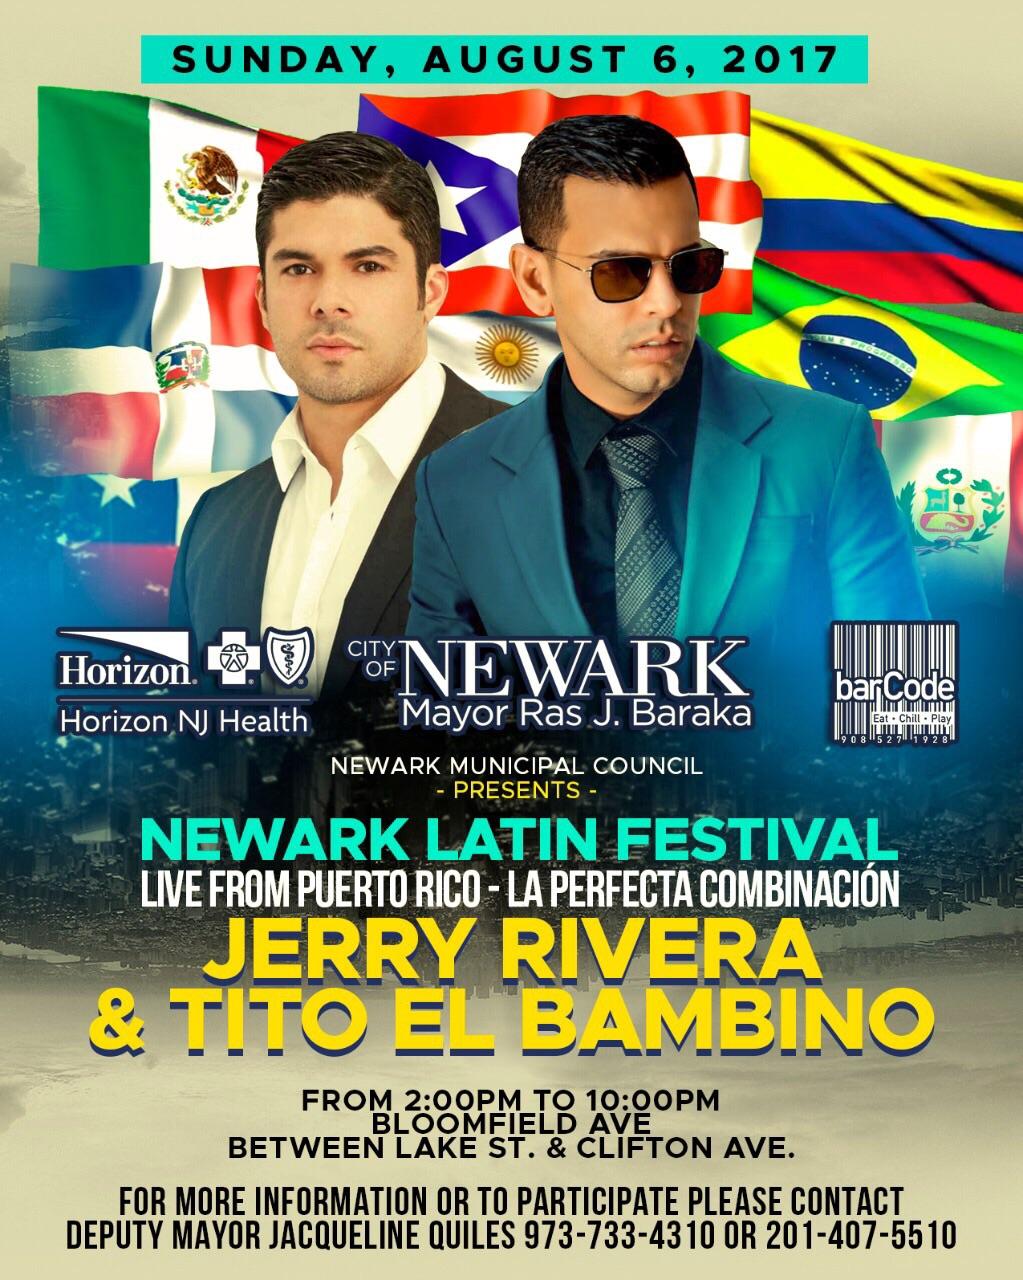 Newark Events: City of Newark to Host Mayor Ras J Baraka 3rd Annual